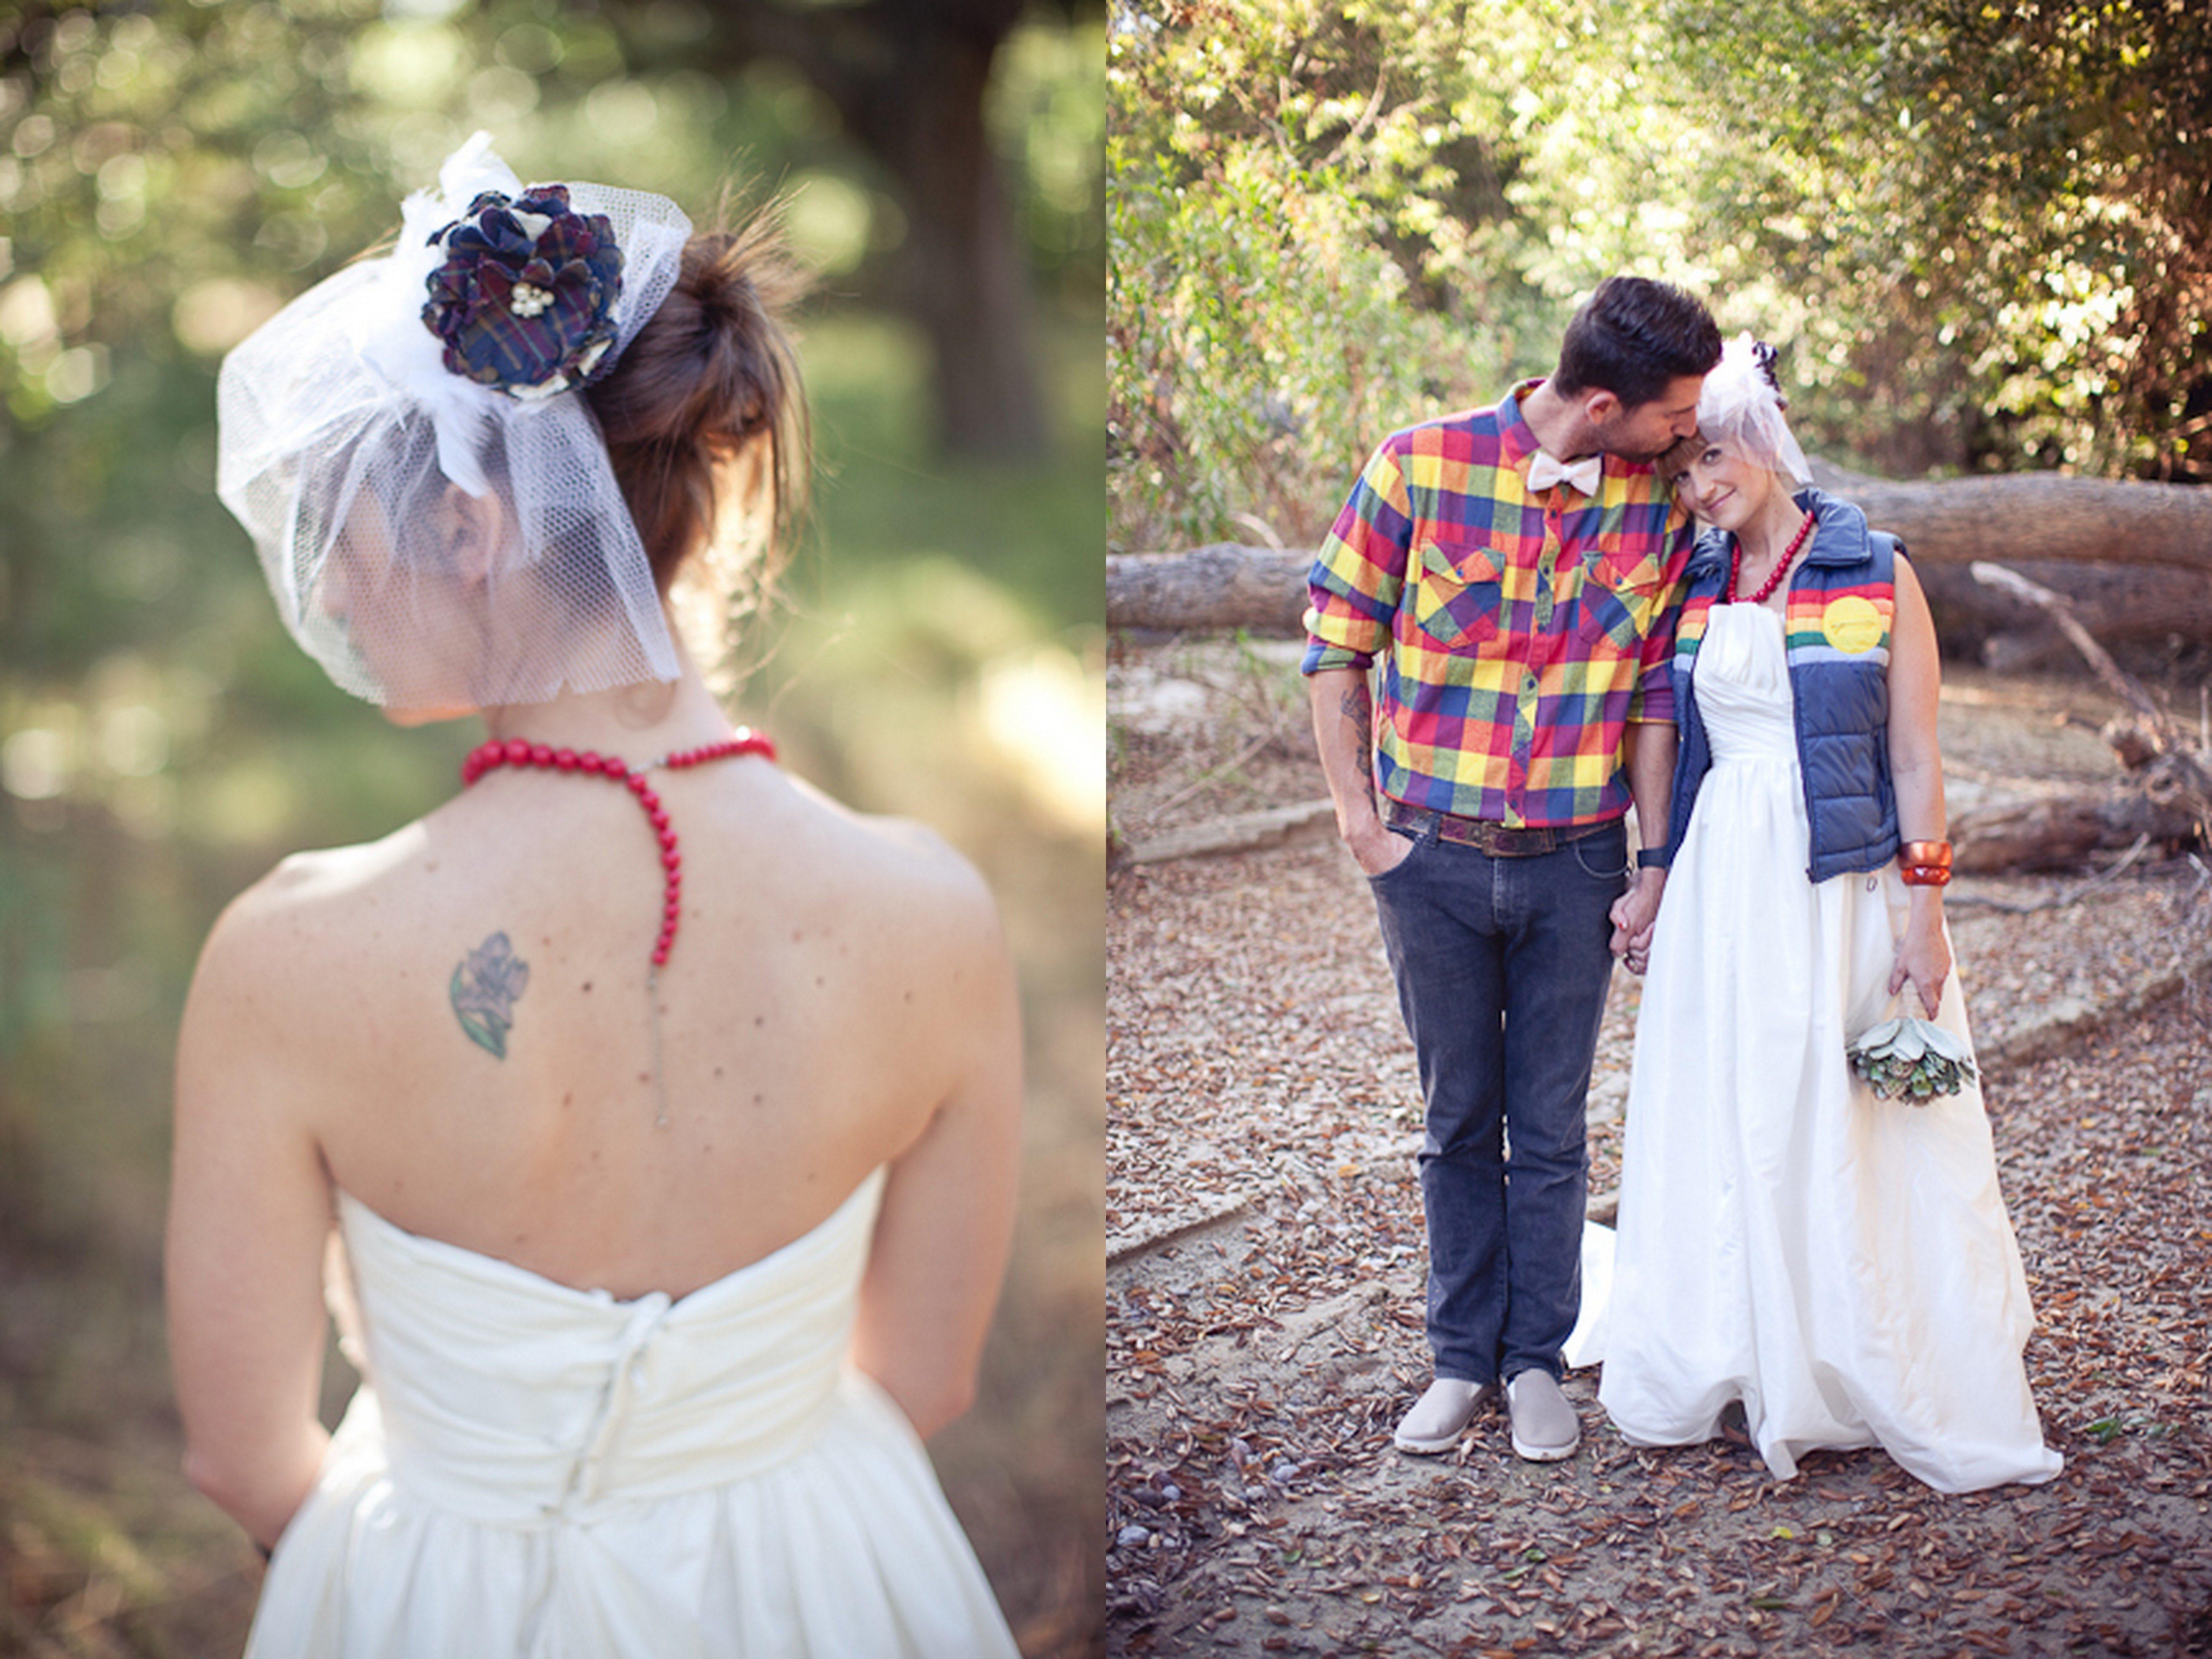 camp wedding dresses